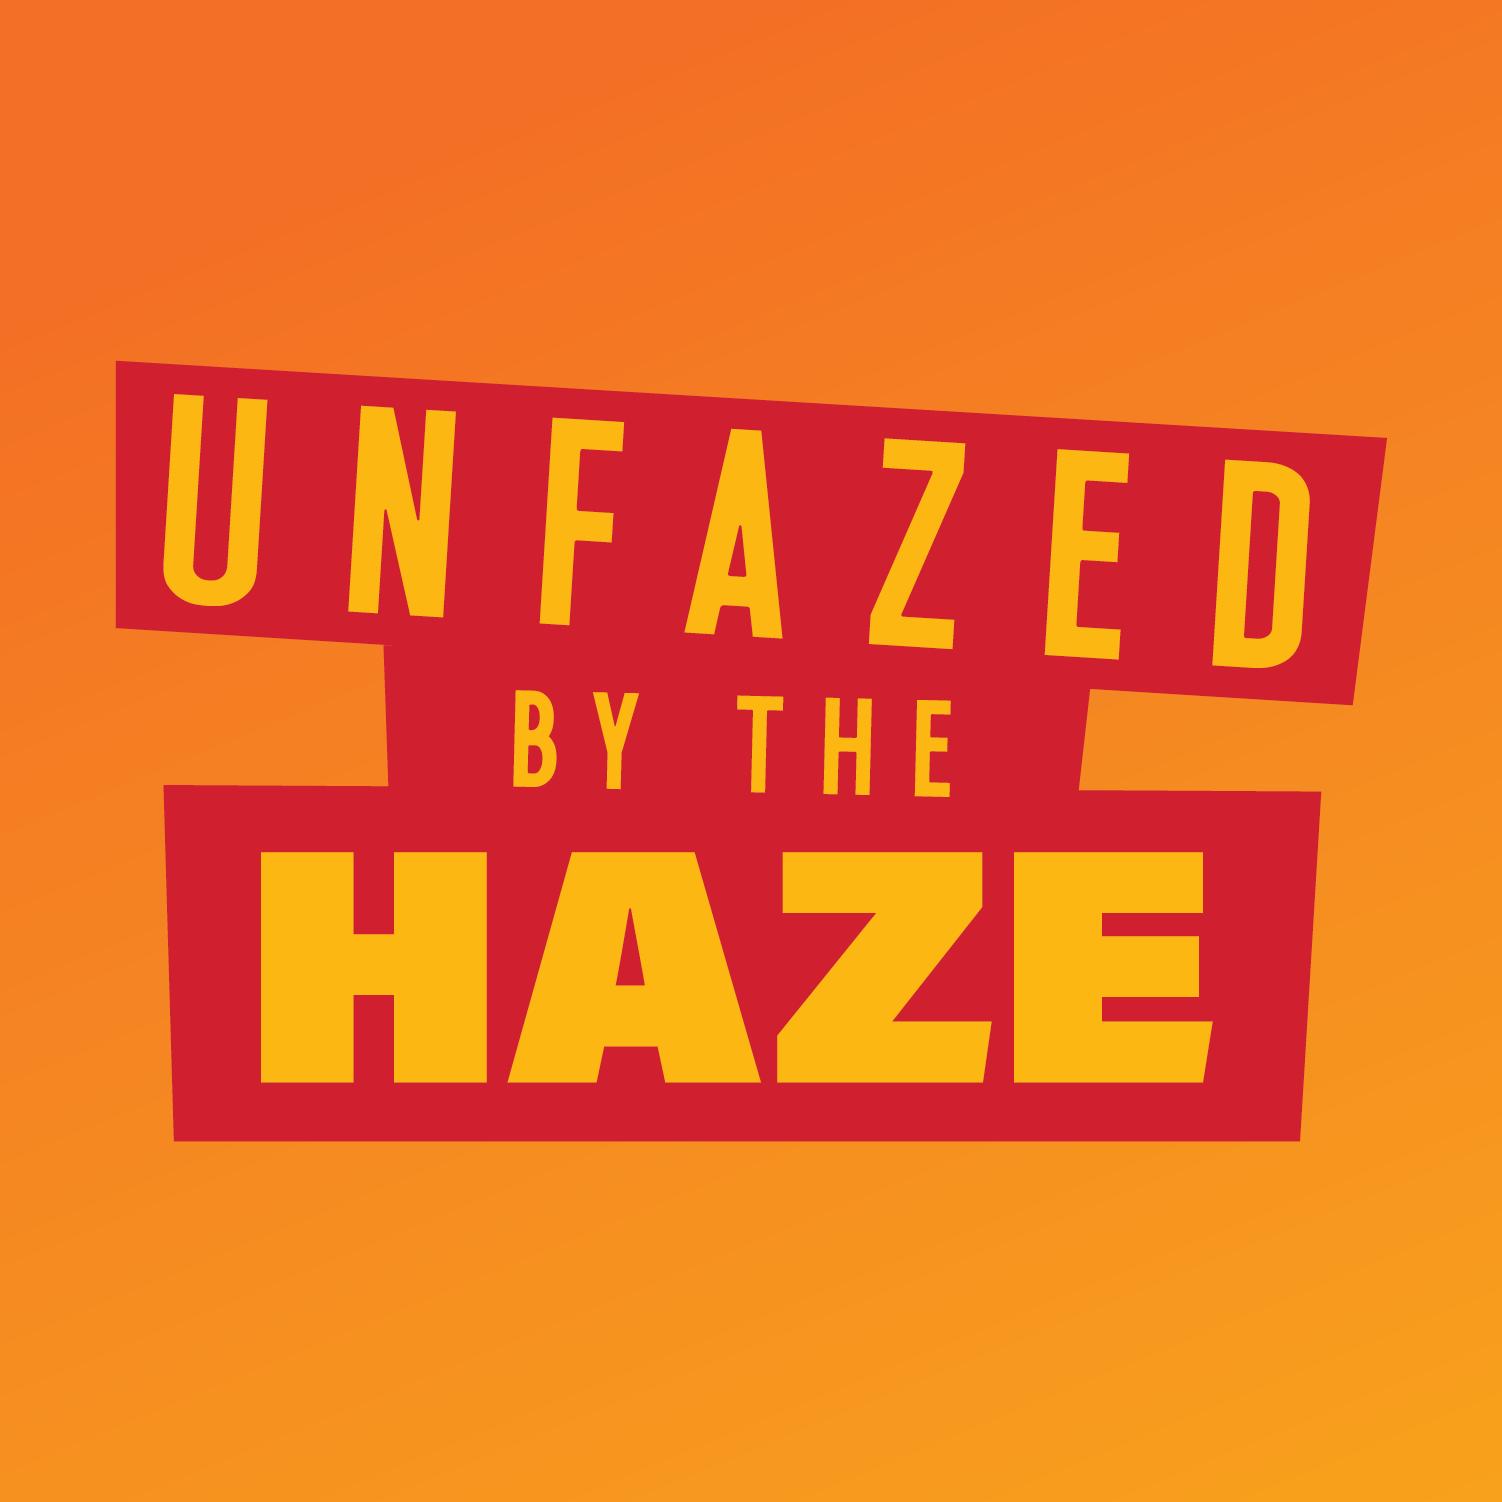 Unfazed_By_The_Haze-01